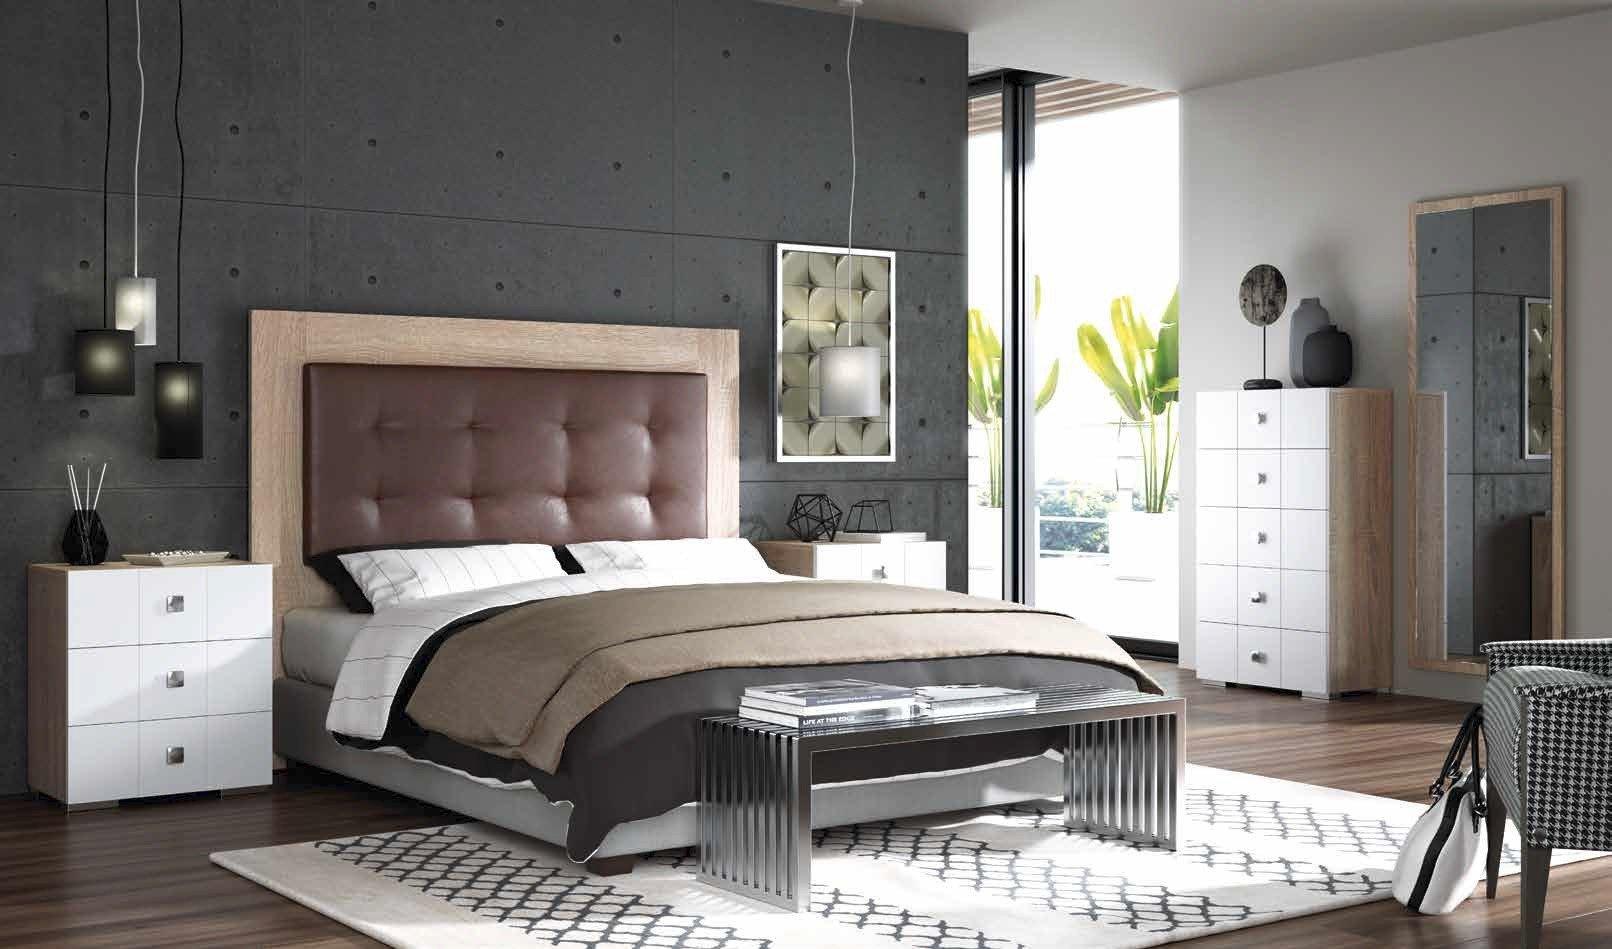 dormitorio moderno color neutro